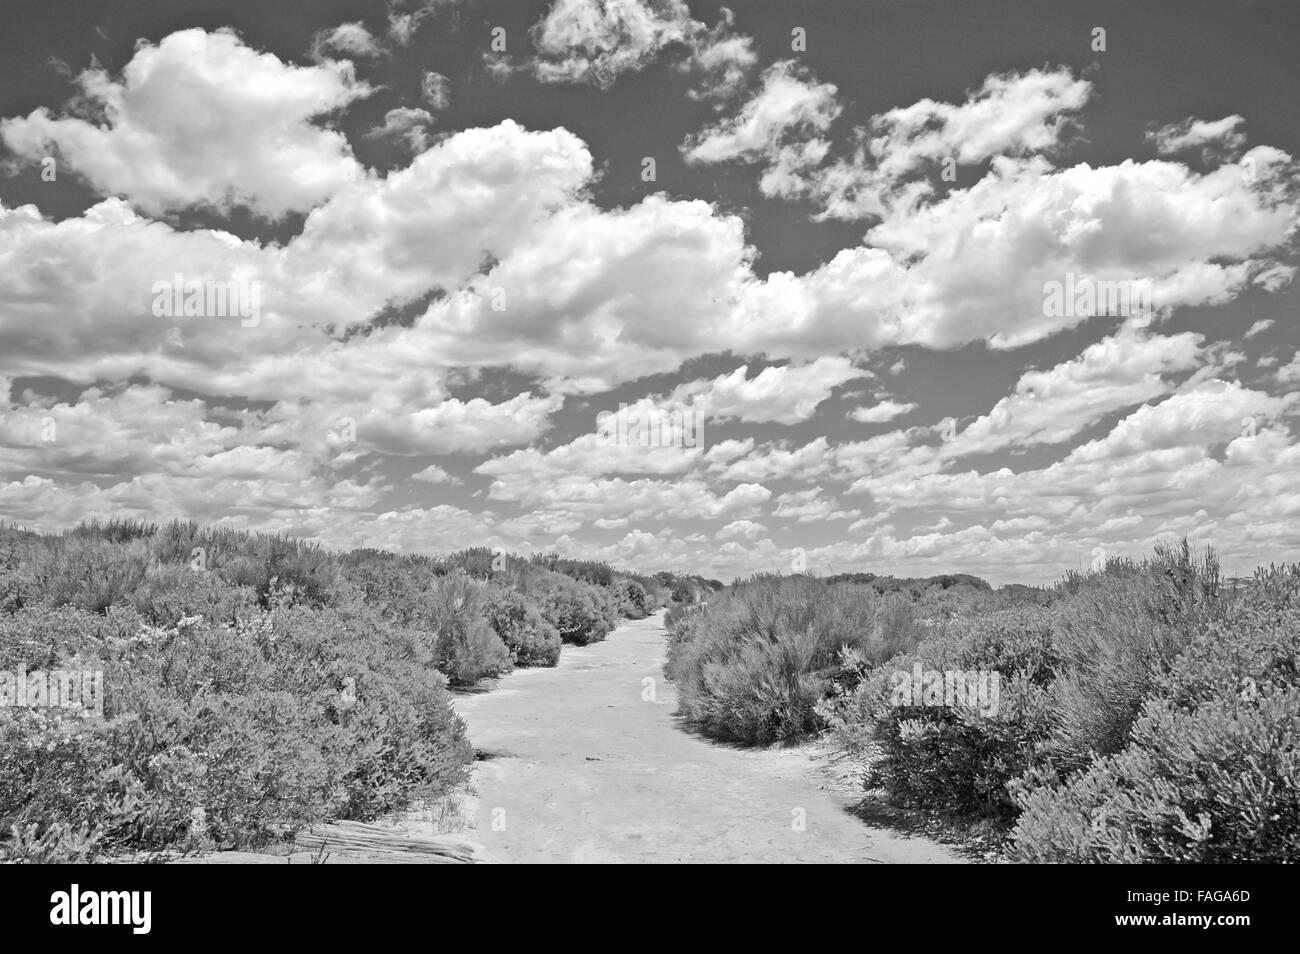 Hiking trail in Royal National Park, Sydney Australia - Stock Image